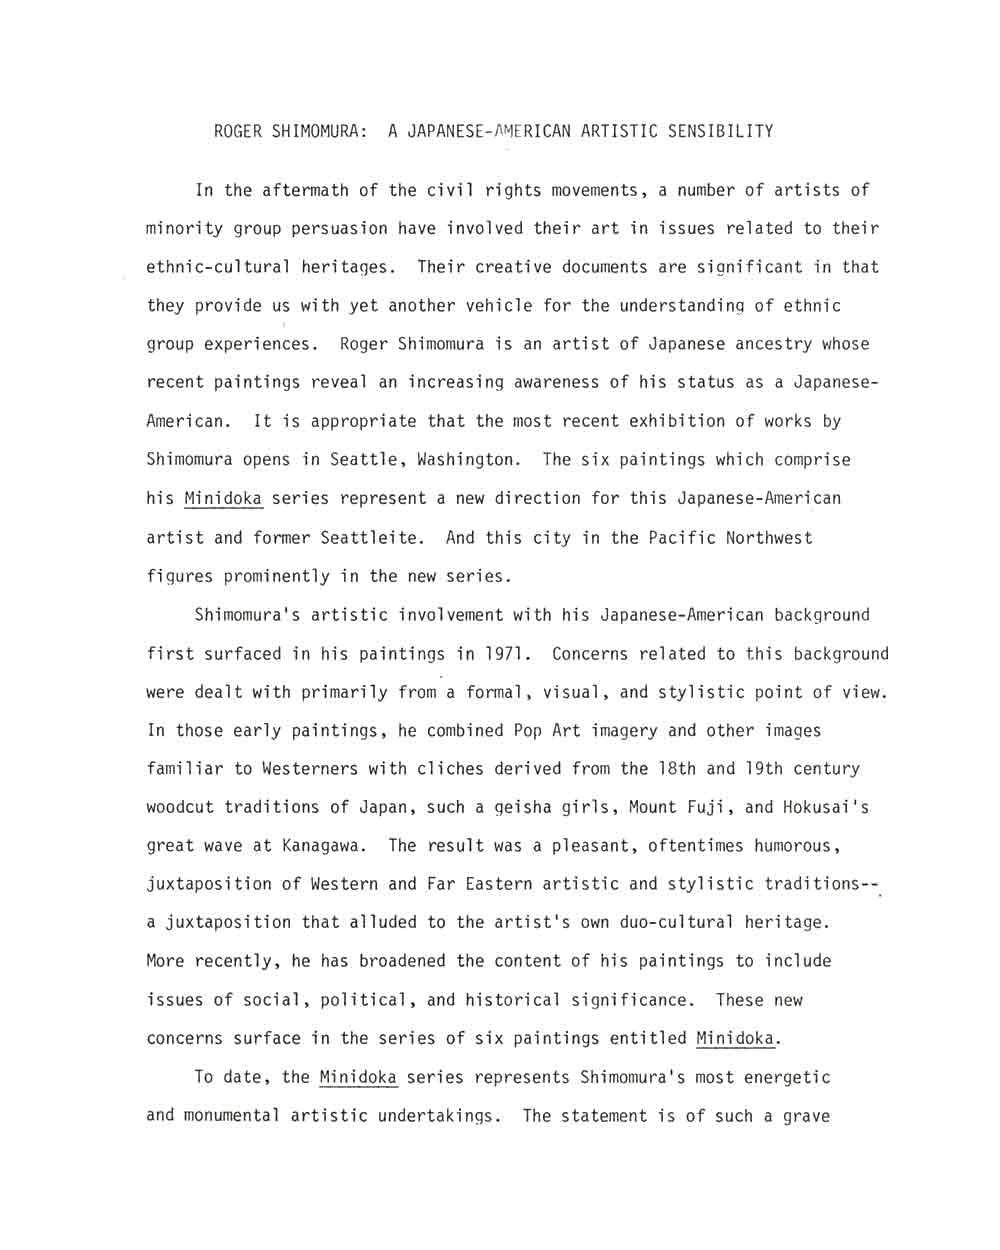 A Japanese-American Artistic Sensibility, pg 1